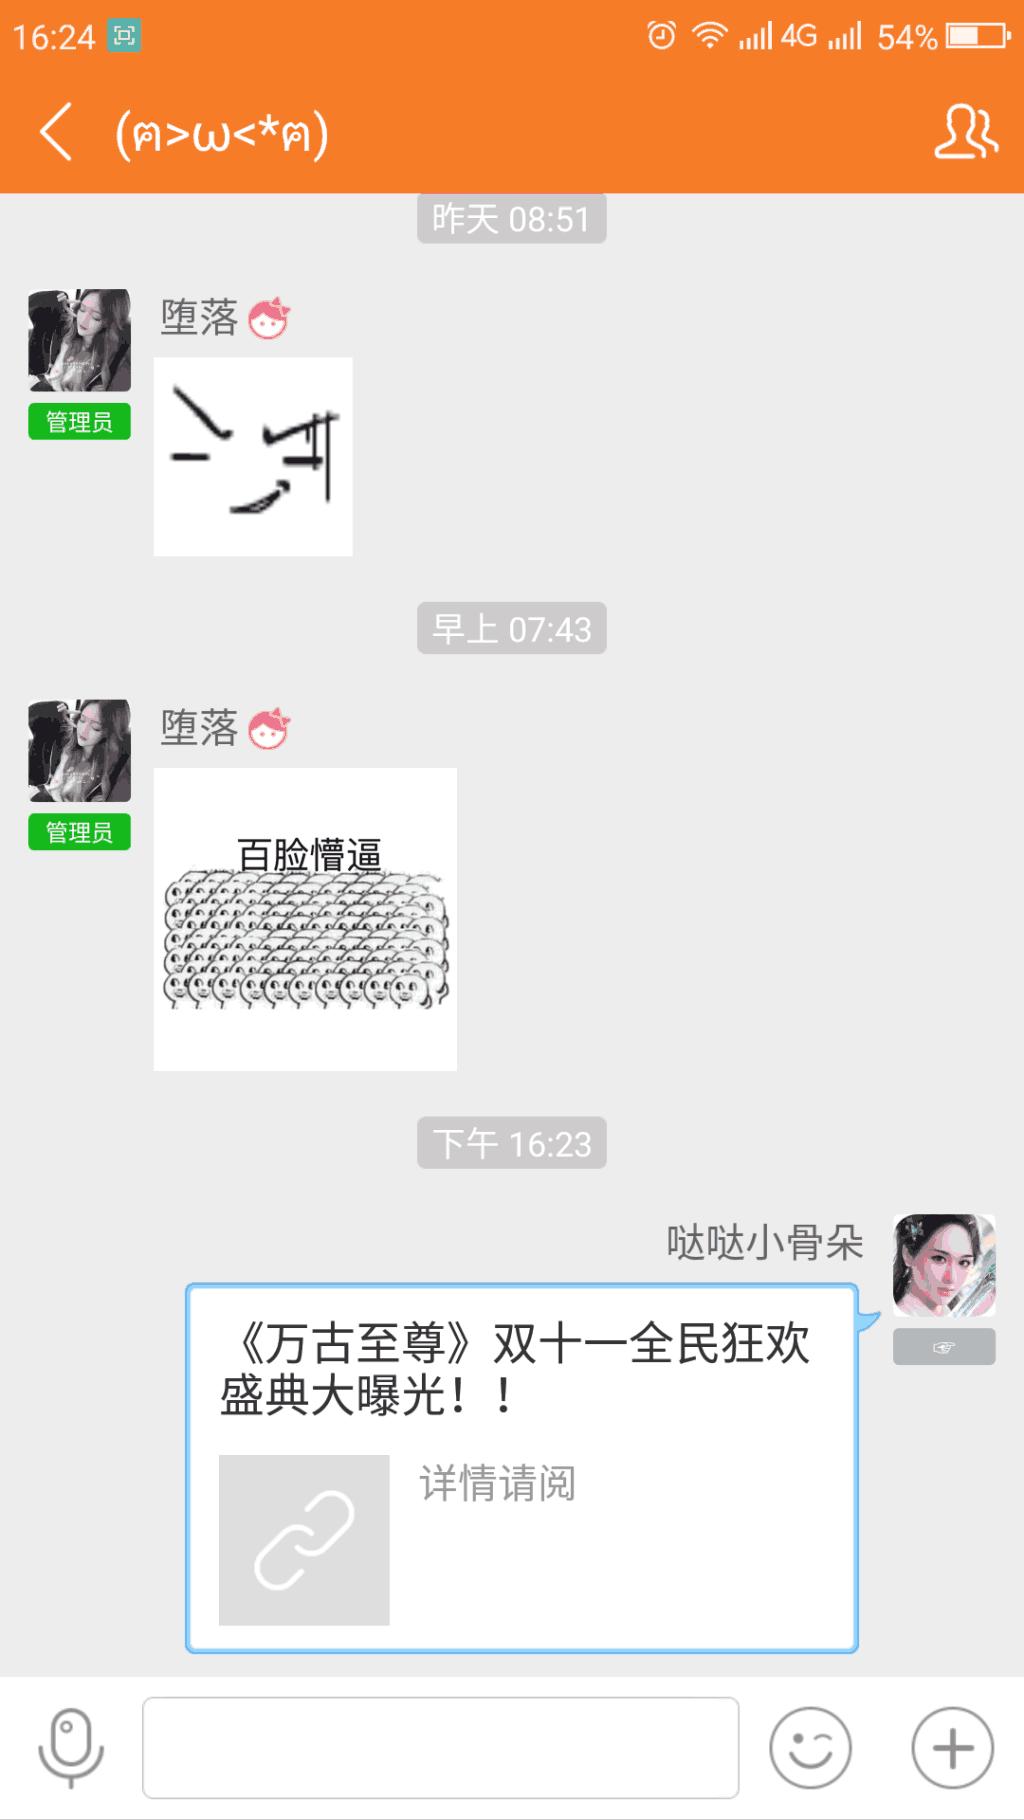 Screenshot_2018s11s11s16s24s07.png